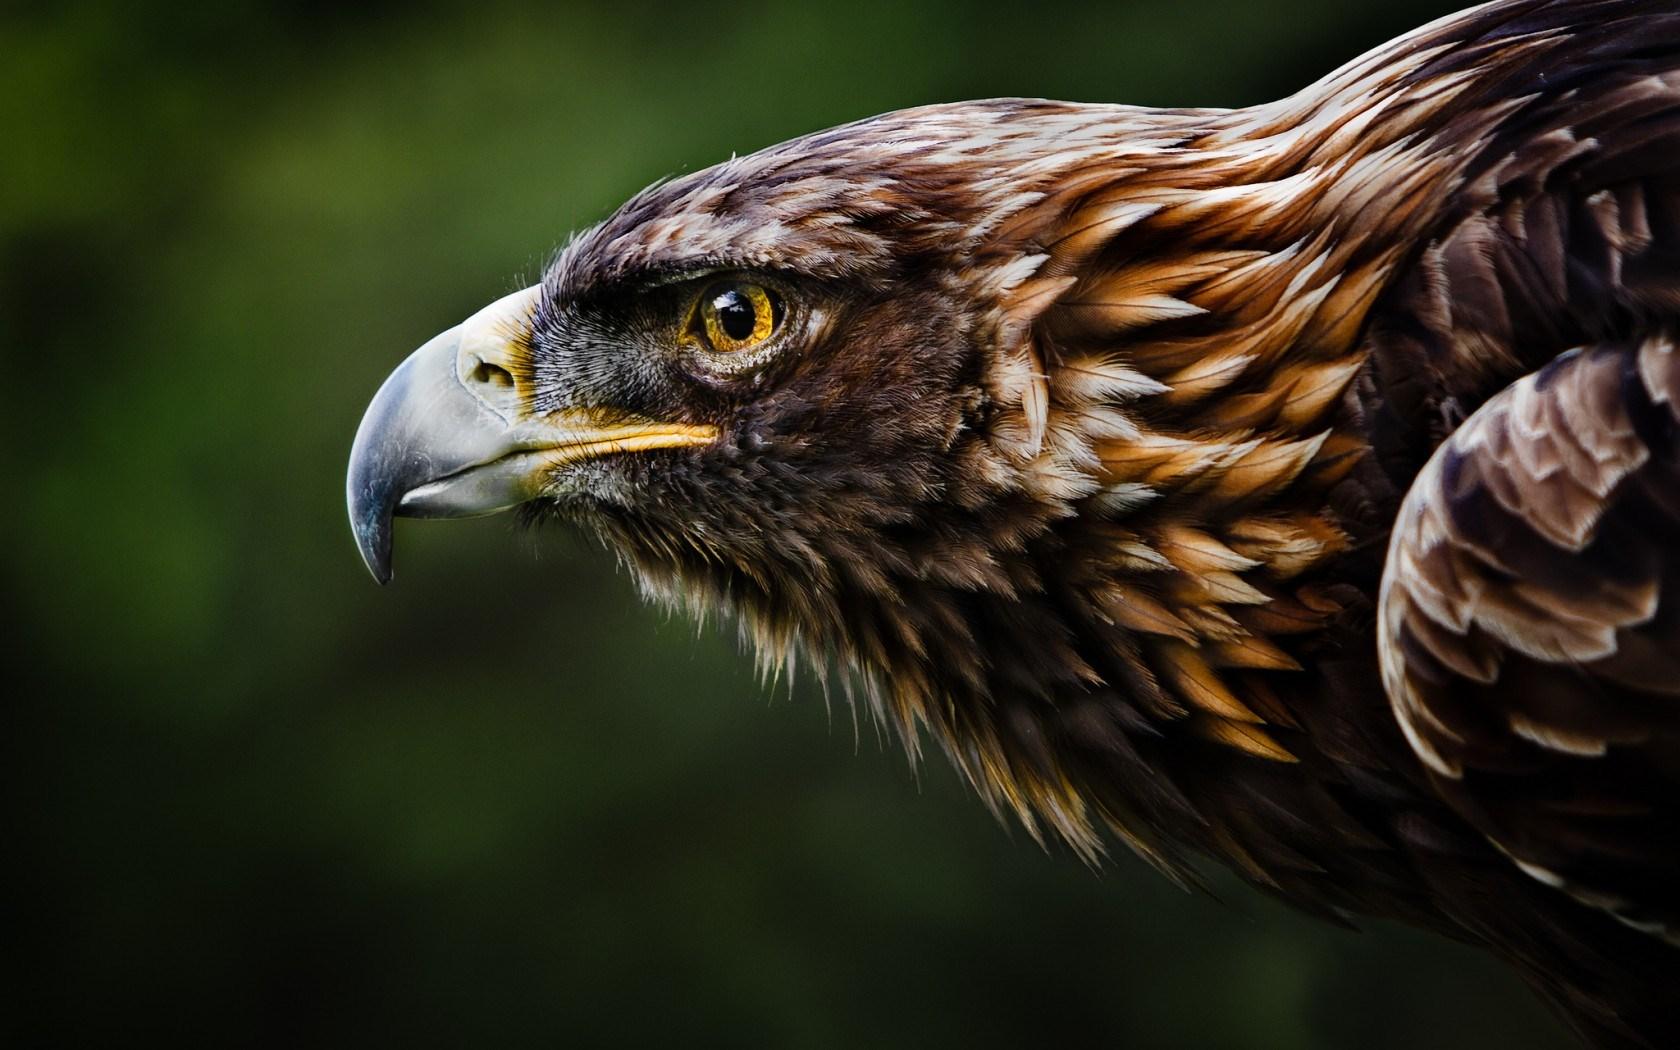 wallpaper eagle hd